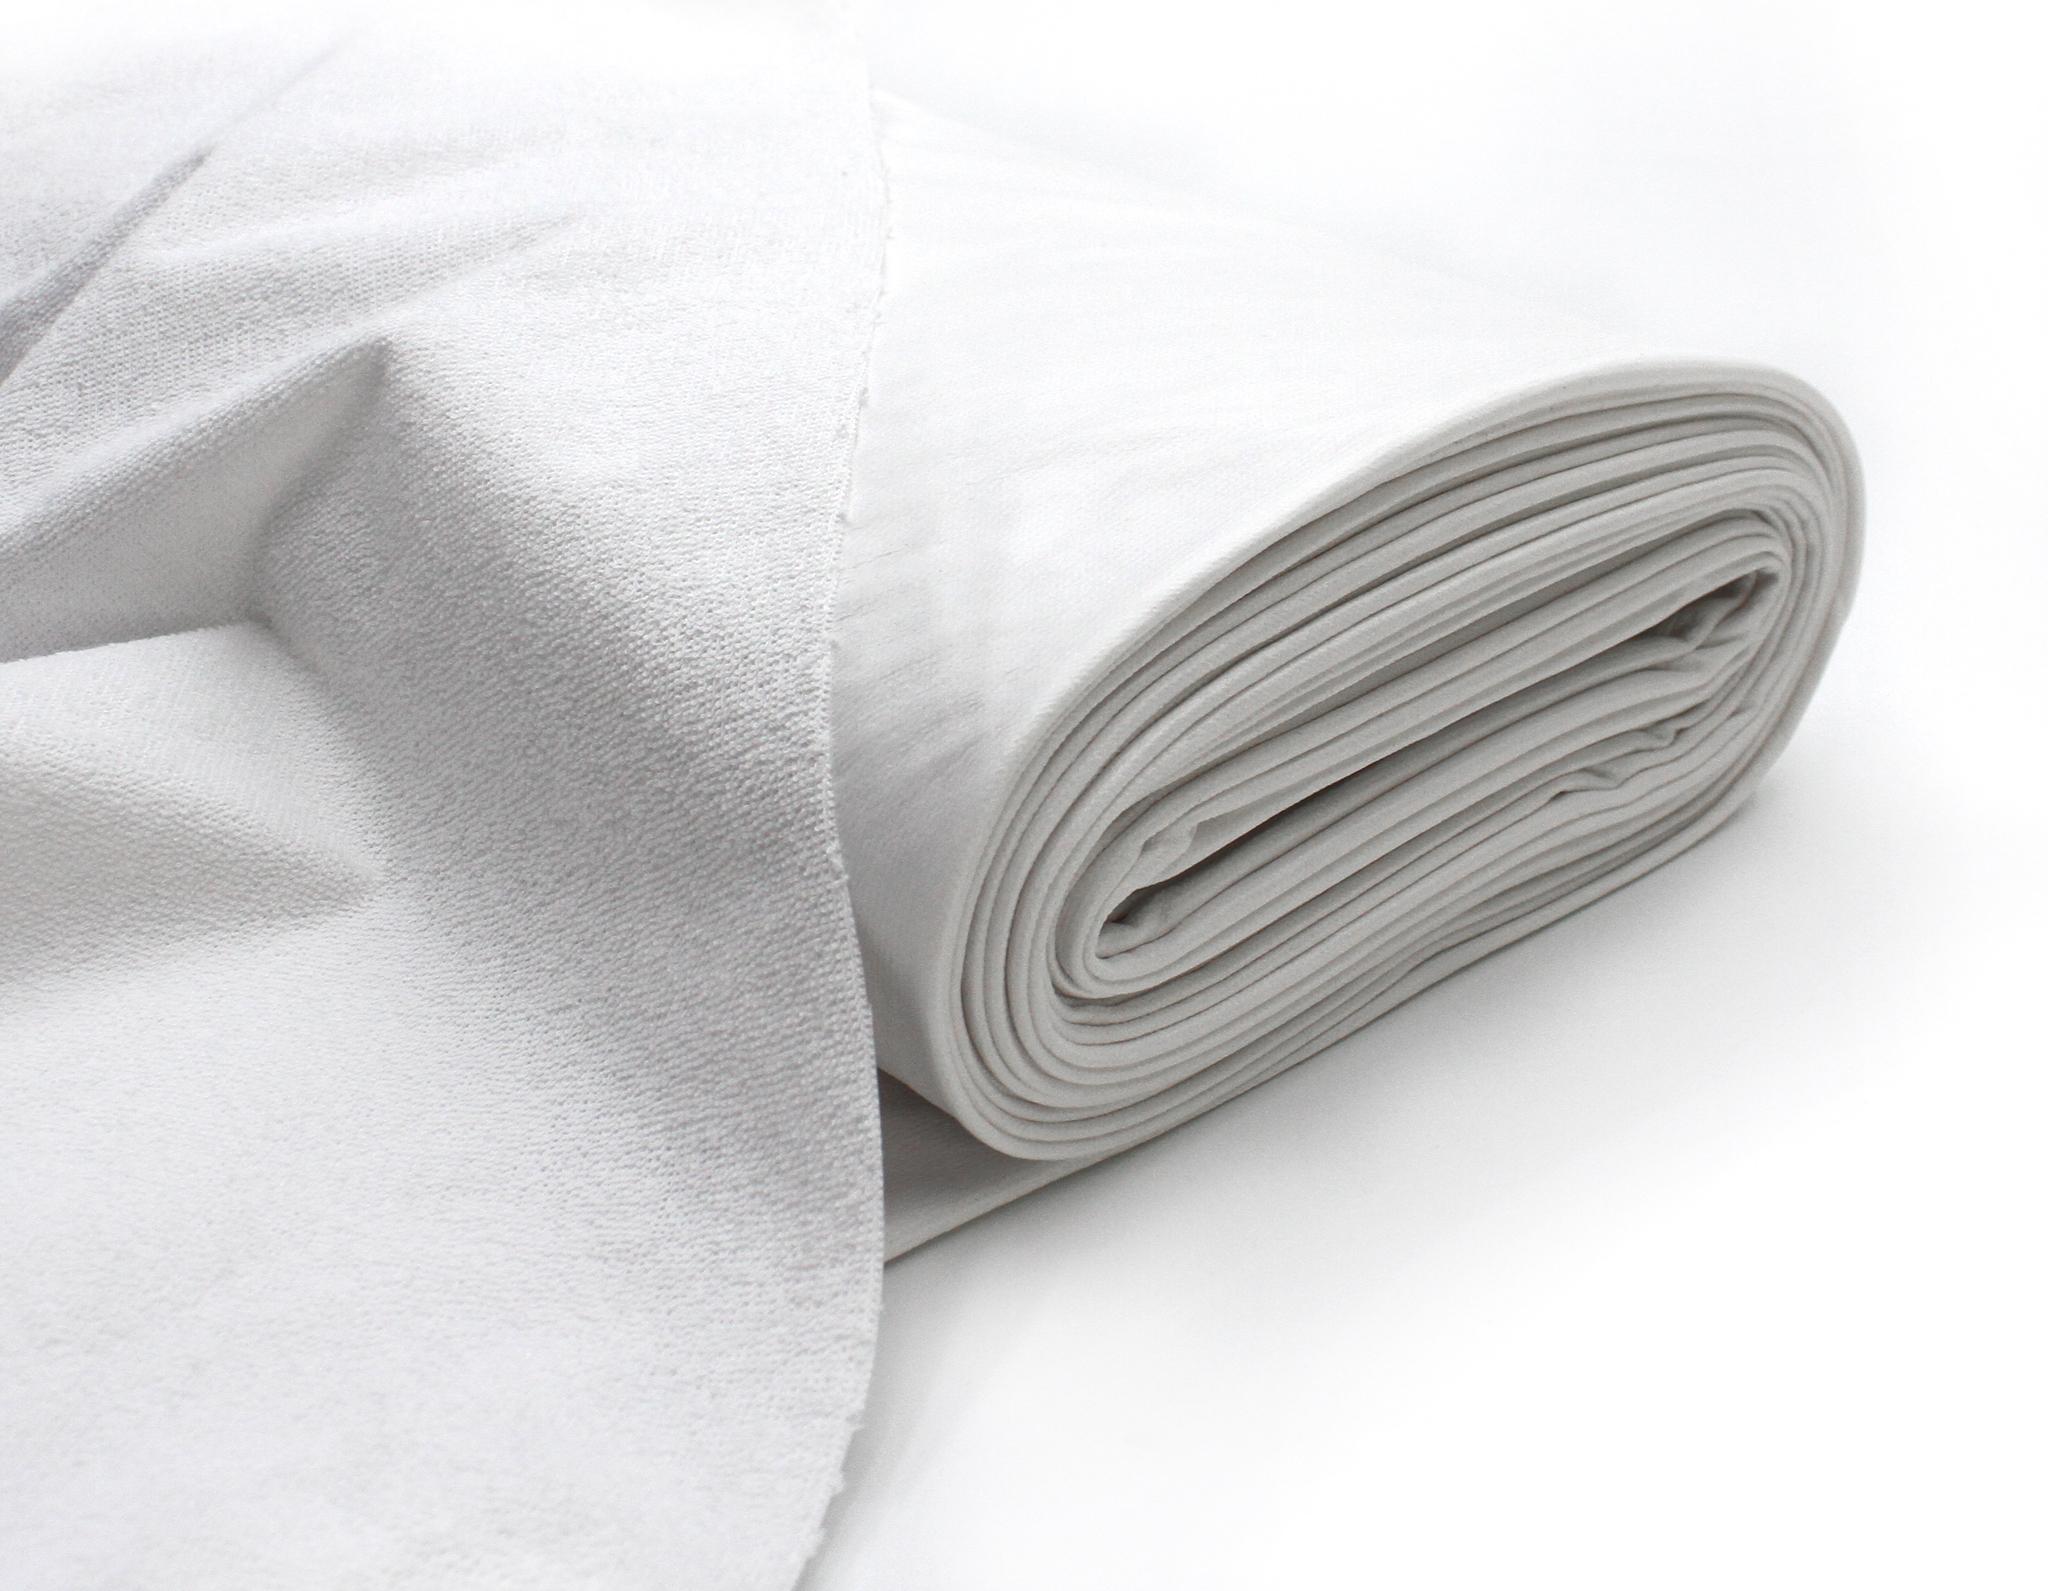 Непромокаемая махра х/б, ширина 205см, белый цвет